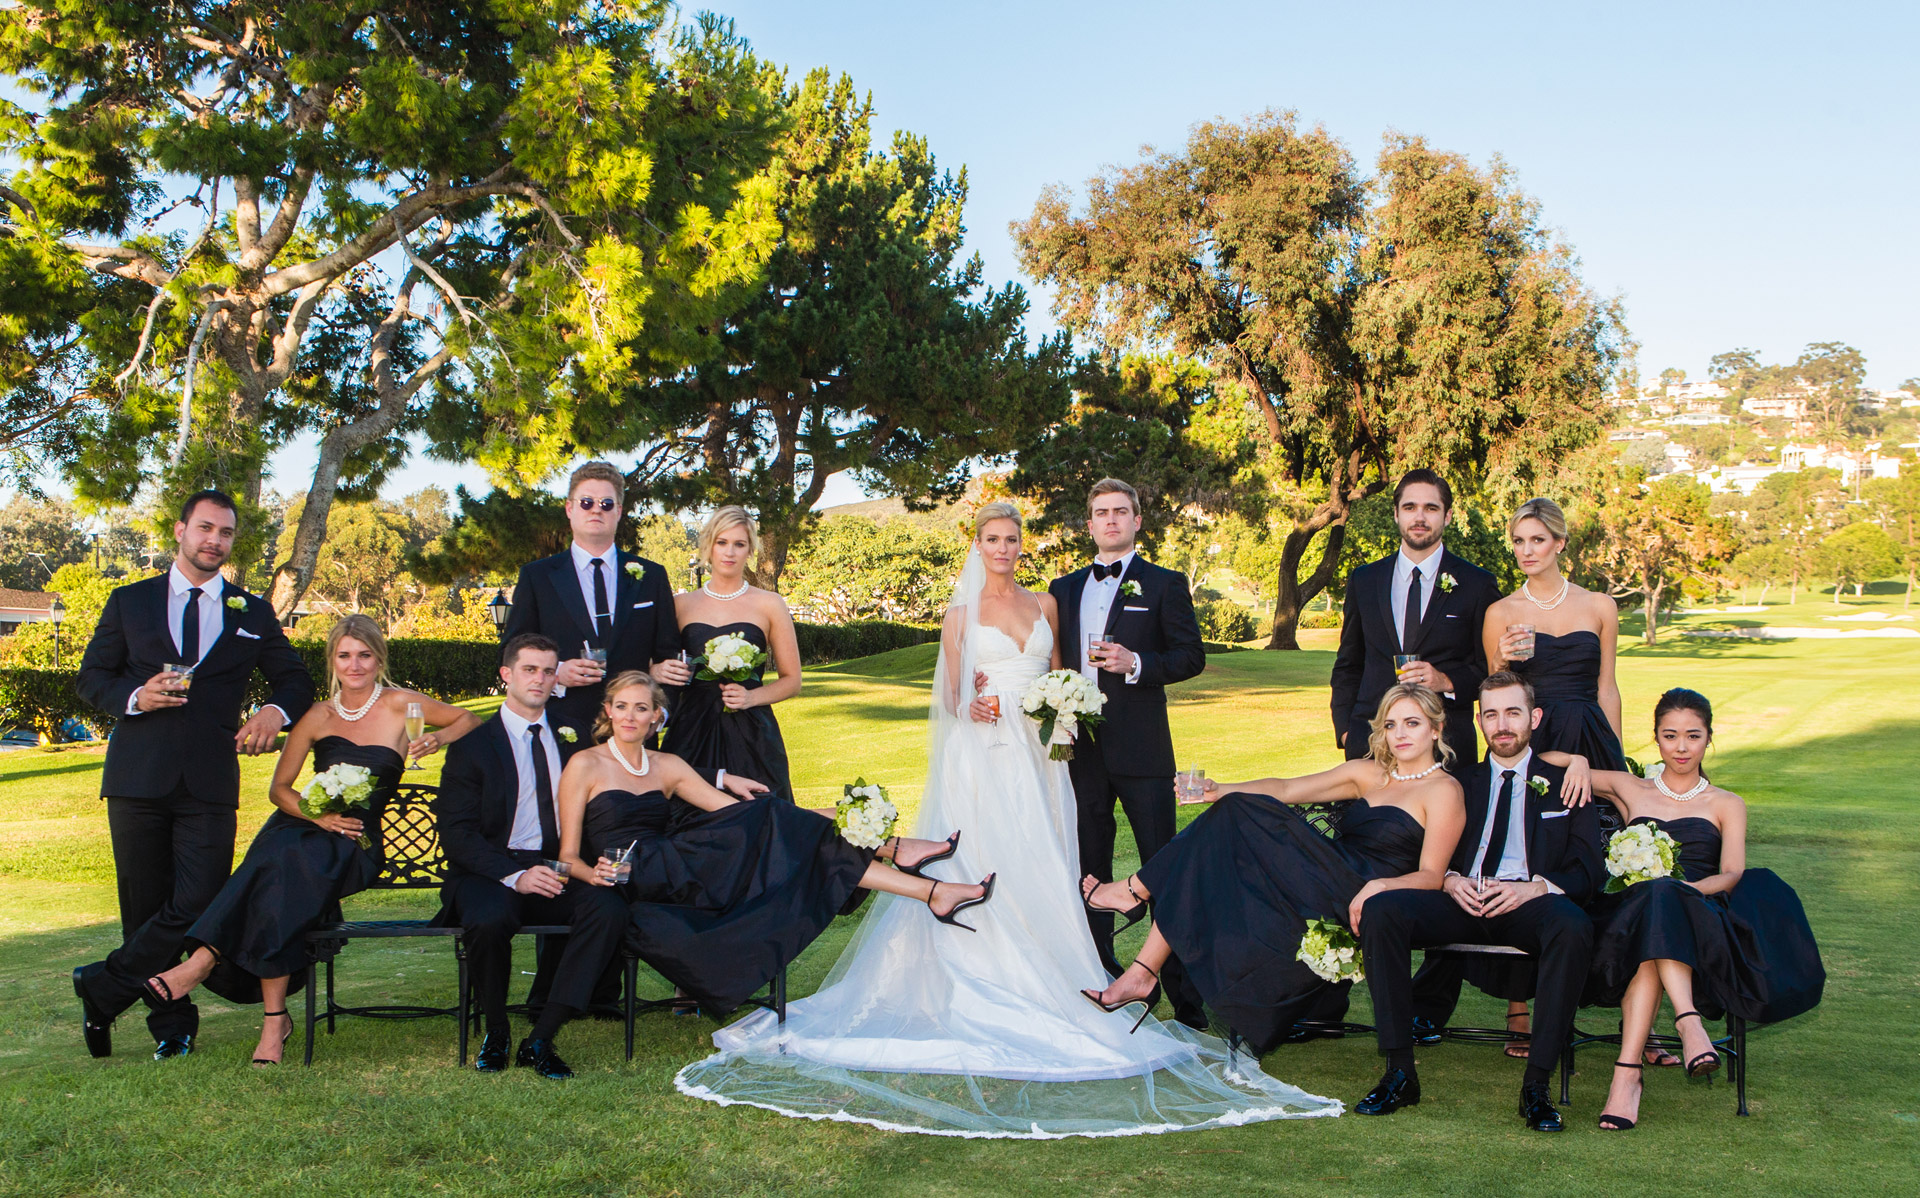 San Diego wedding photography by luxury wedding photographer Paul Barnett